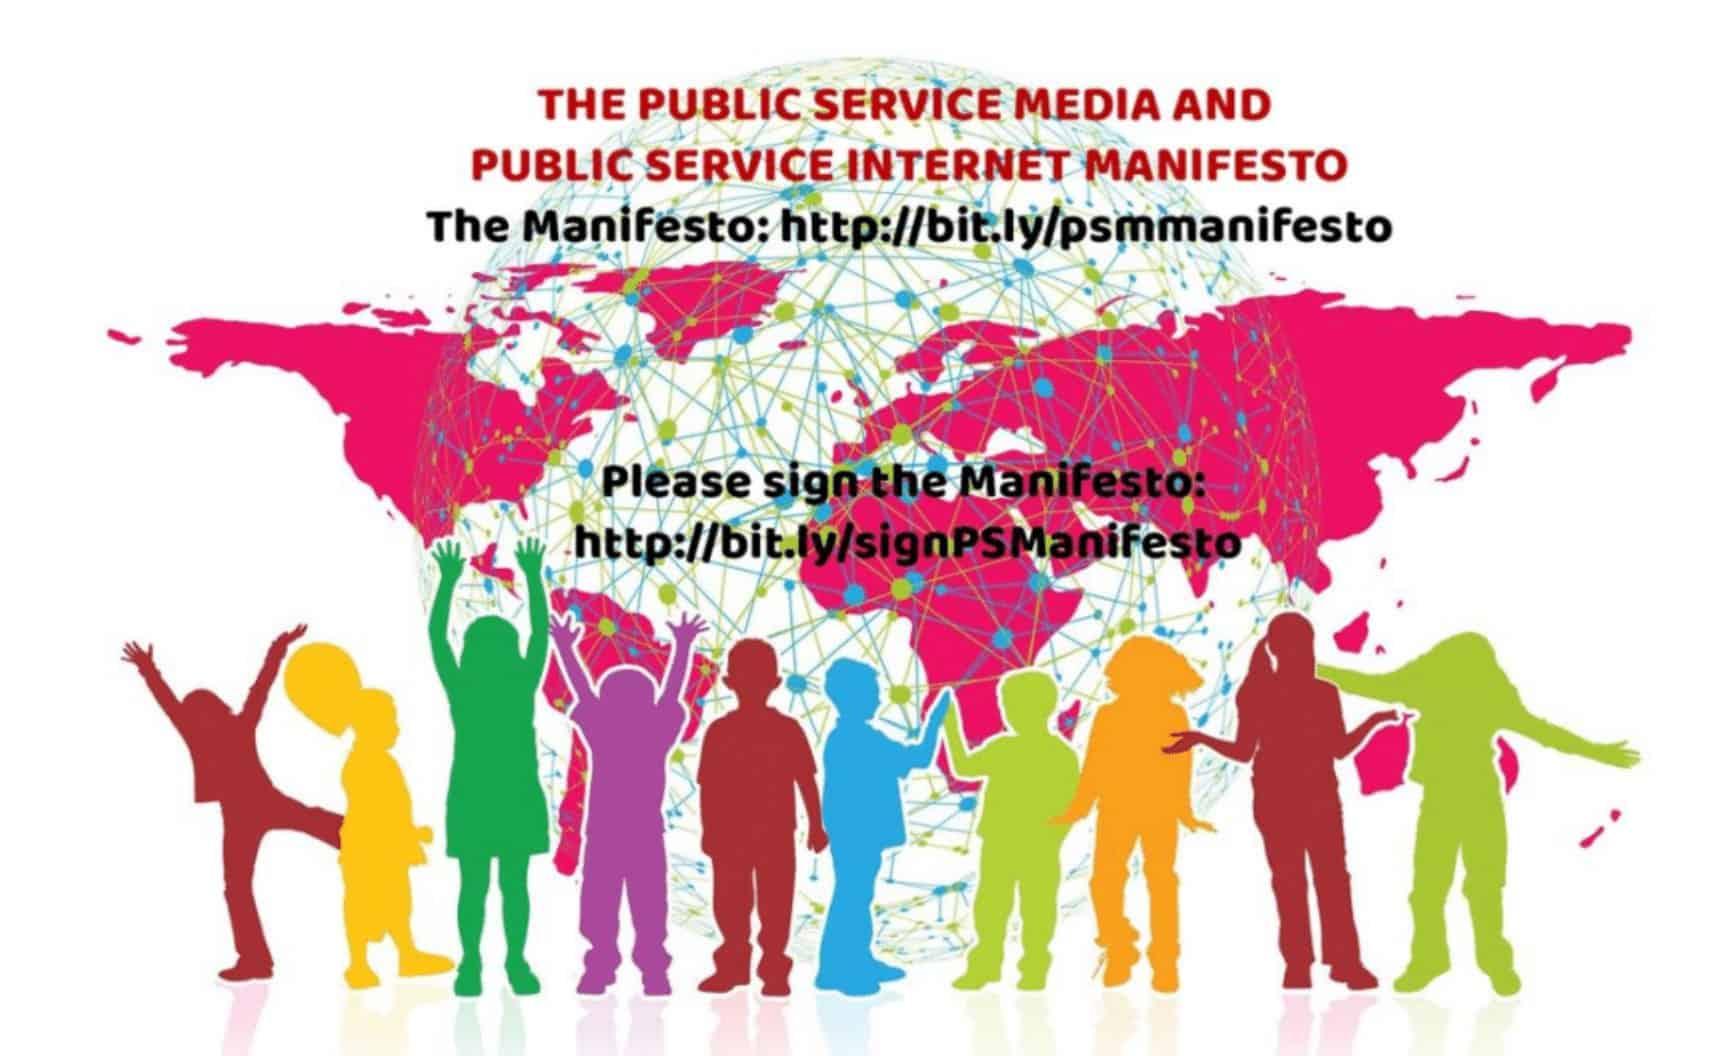 Call for a public service Internet